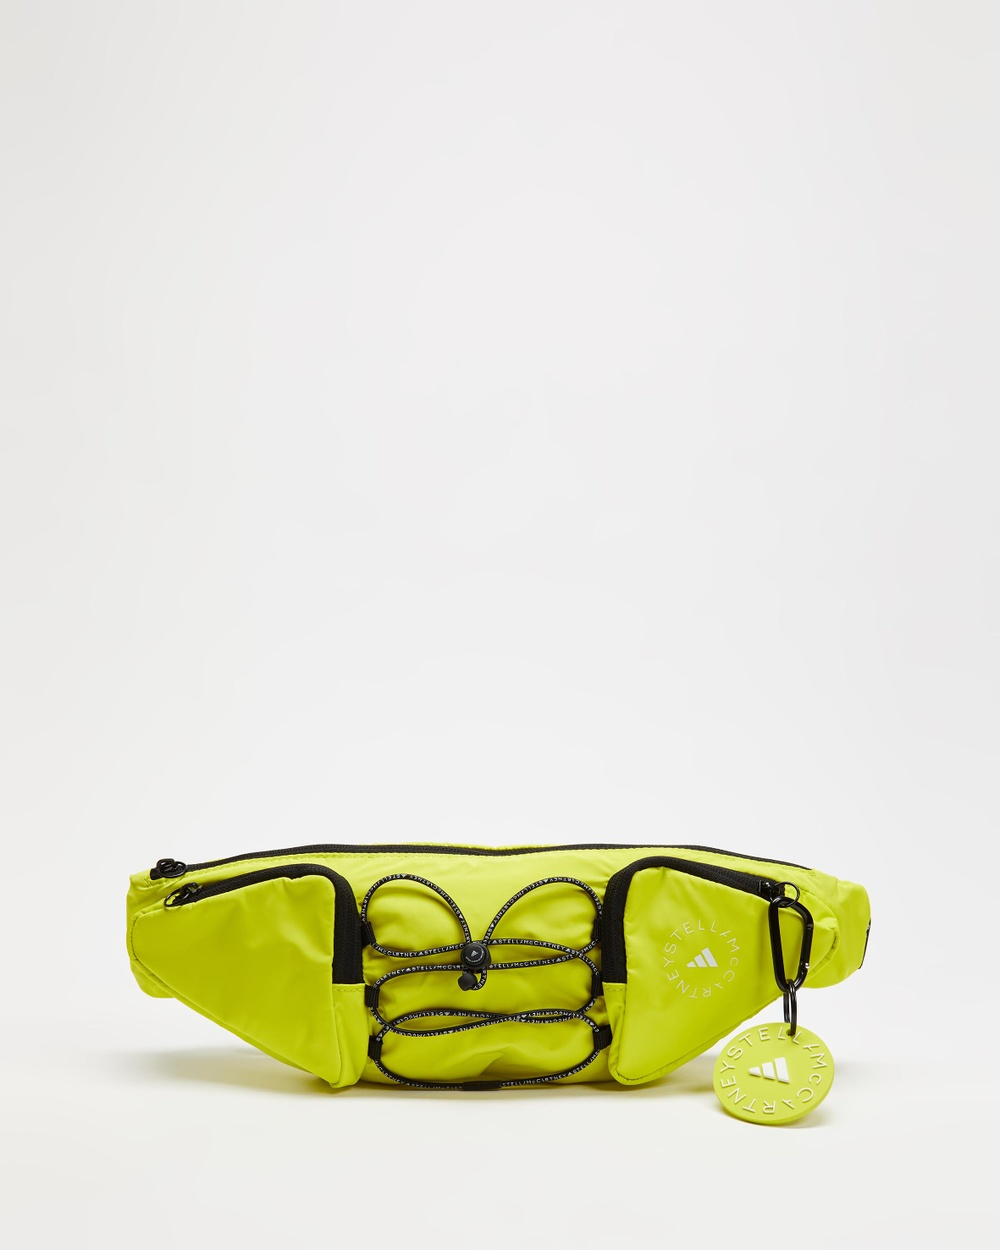 adidas by Stella McCartney Bumbag Bum Bags Acid Yellow & Black